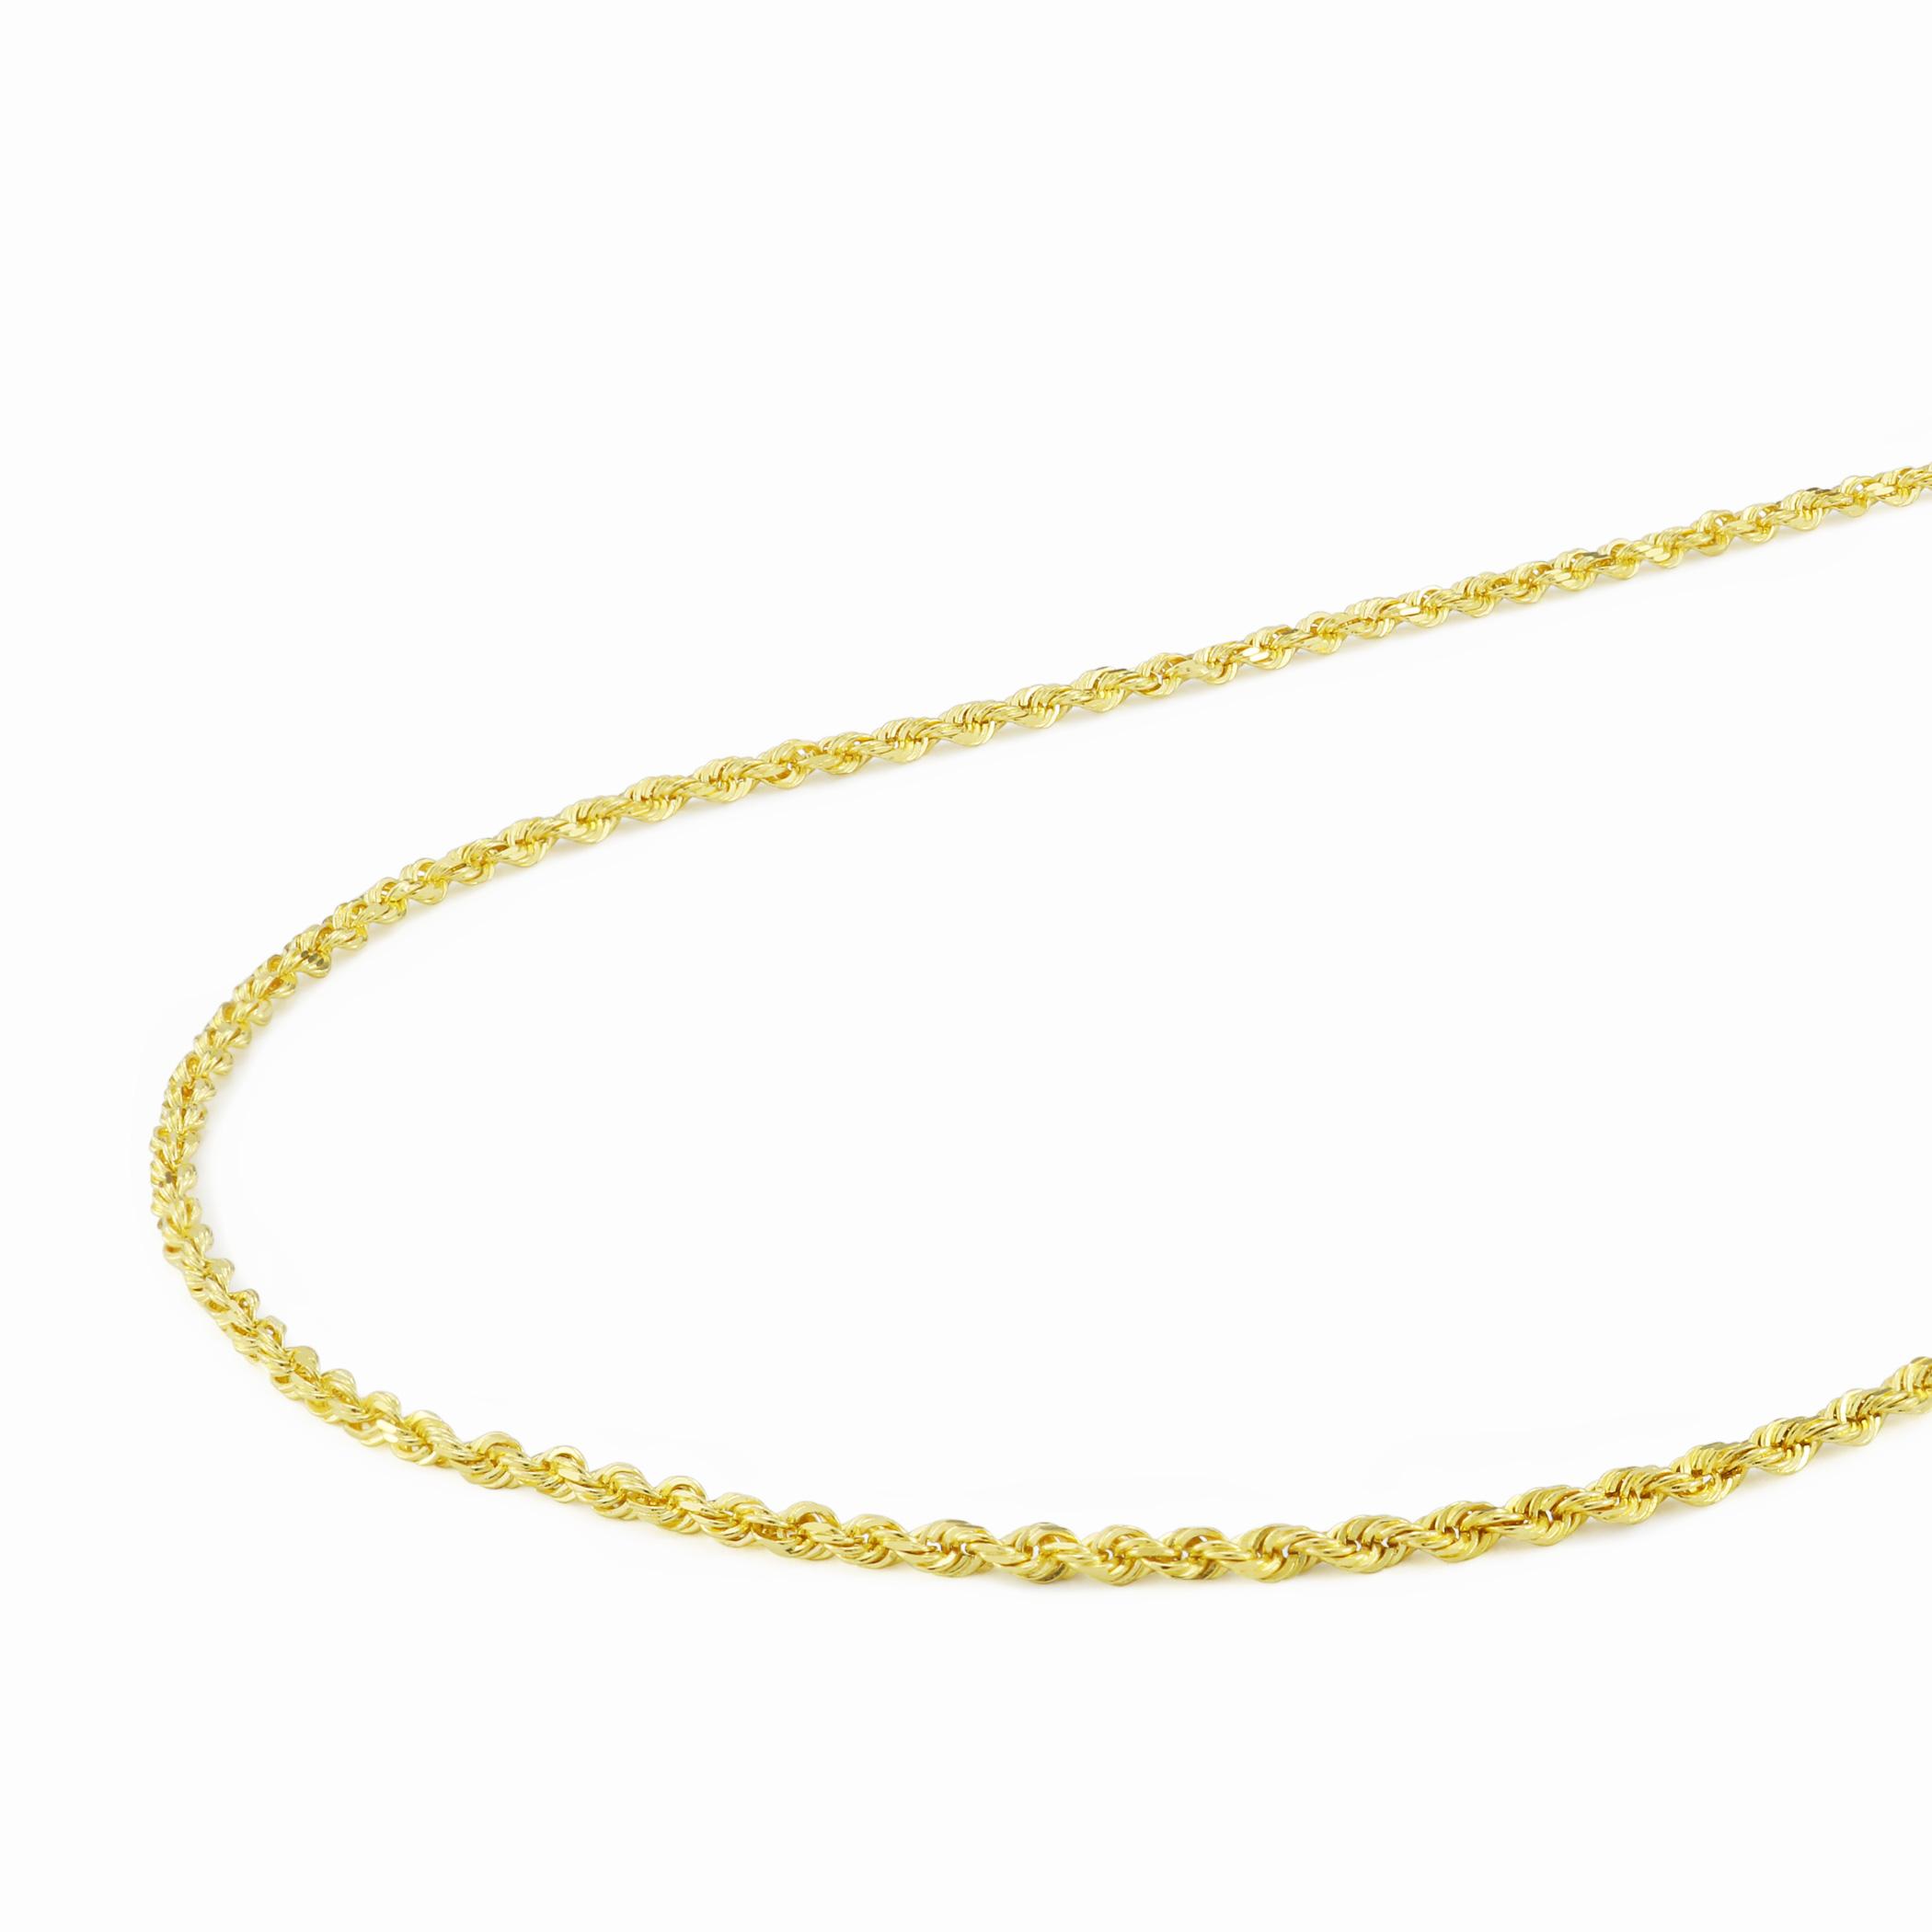 14K Yellow Neckalce 1MM 16 INCH Long 14k 1mm Solid D//C Spiga Chain